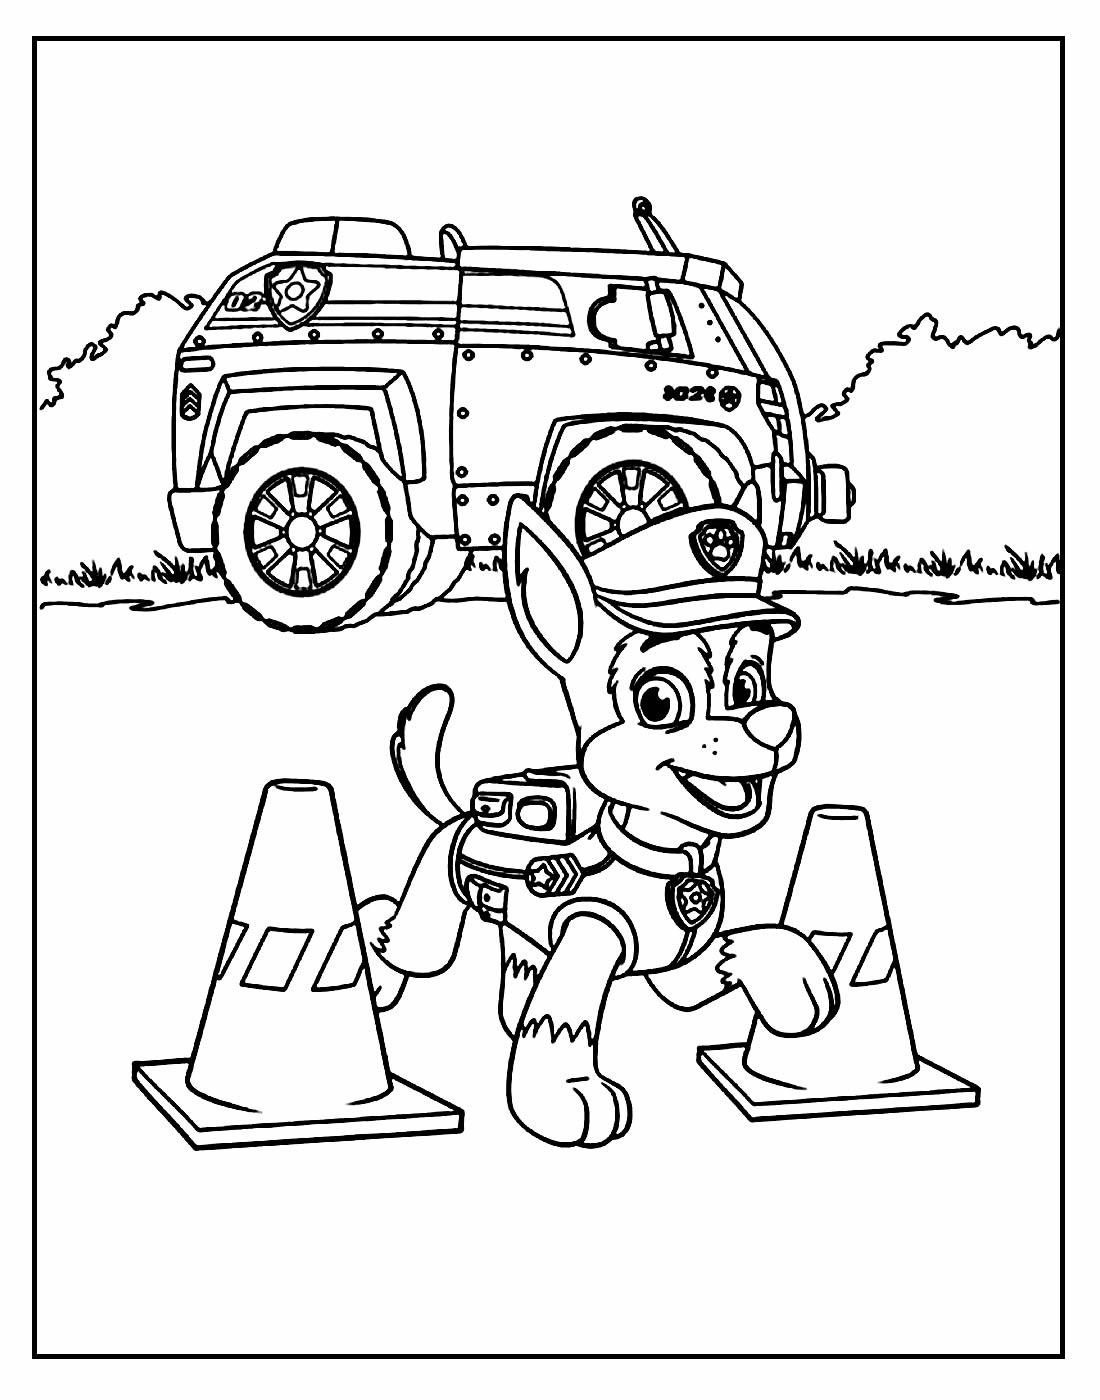 Desenho Patrulha Canina Colorir